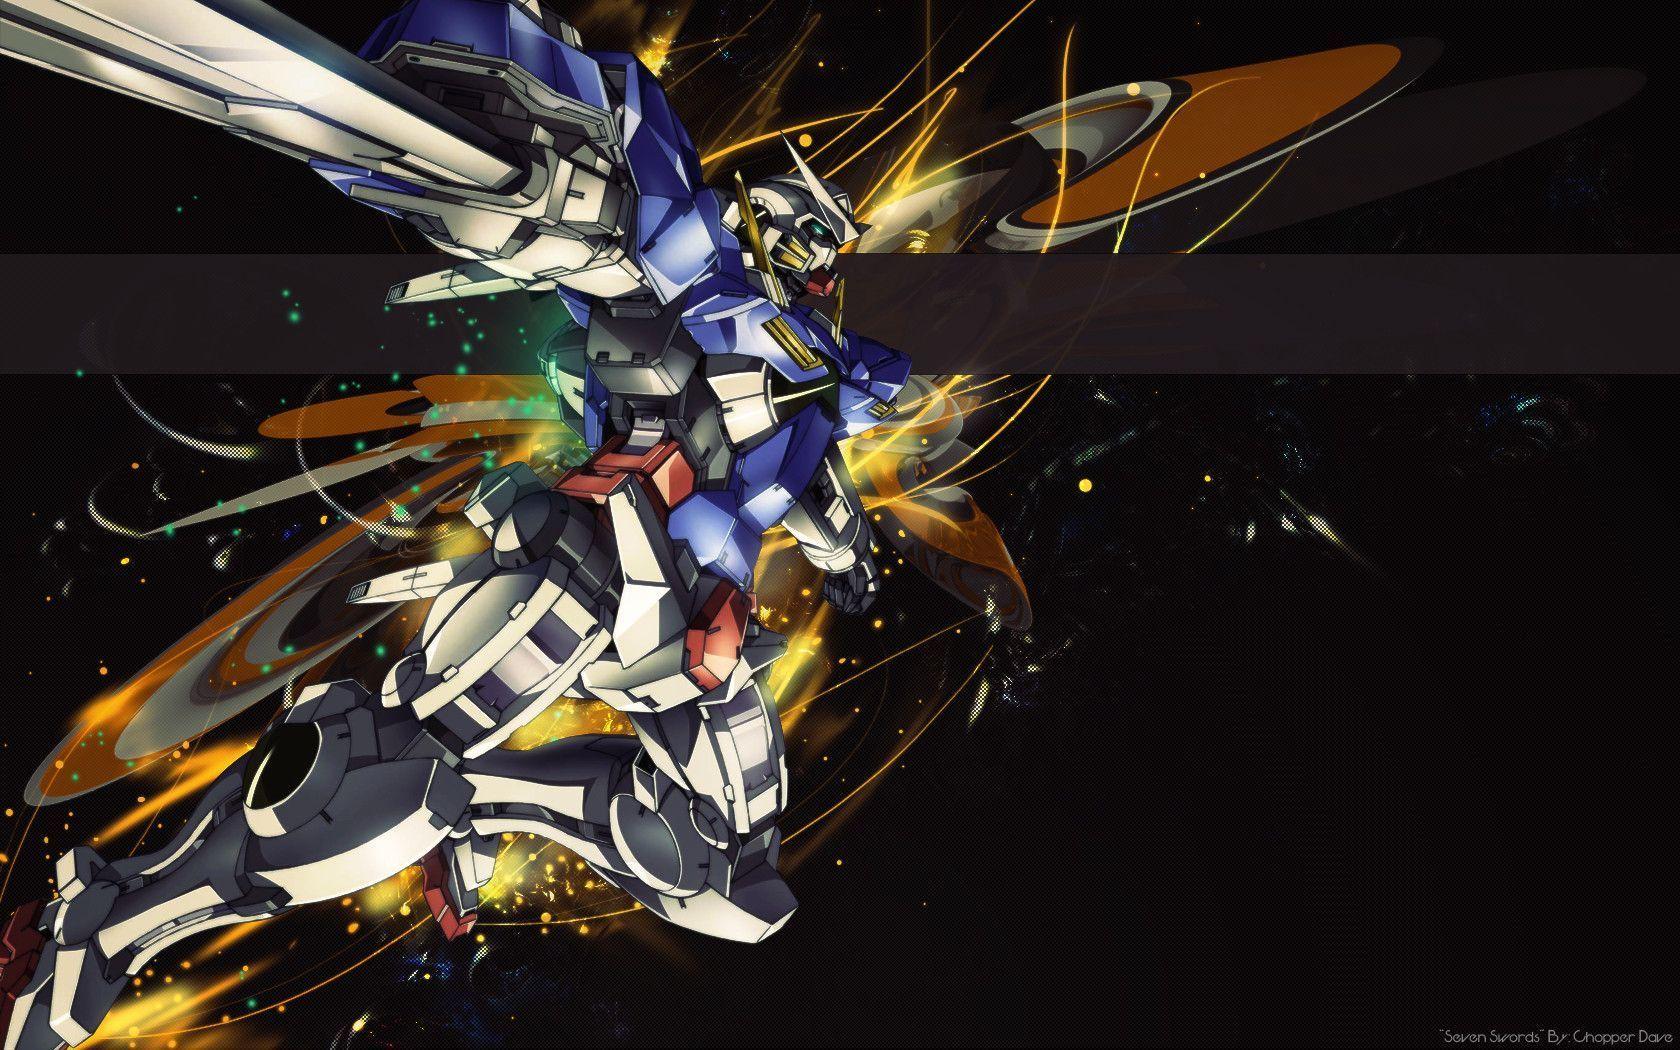 Download Gundam Wallpaper Iphone 4 (10231) Full Size